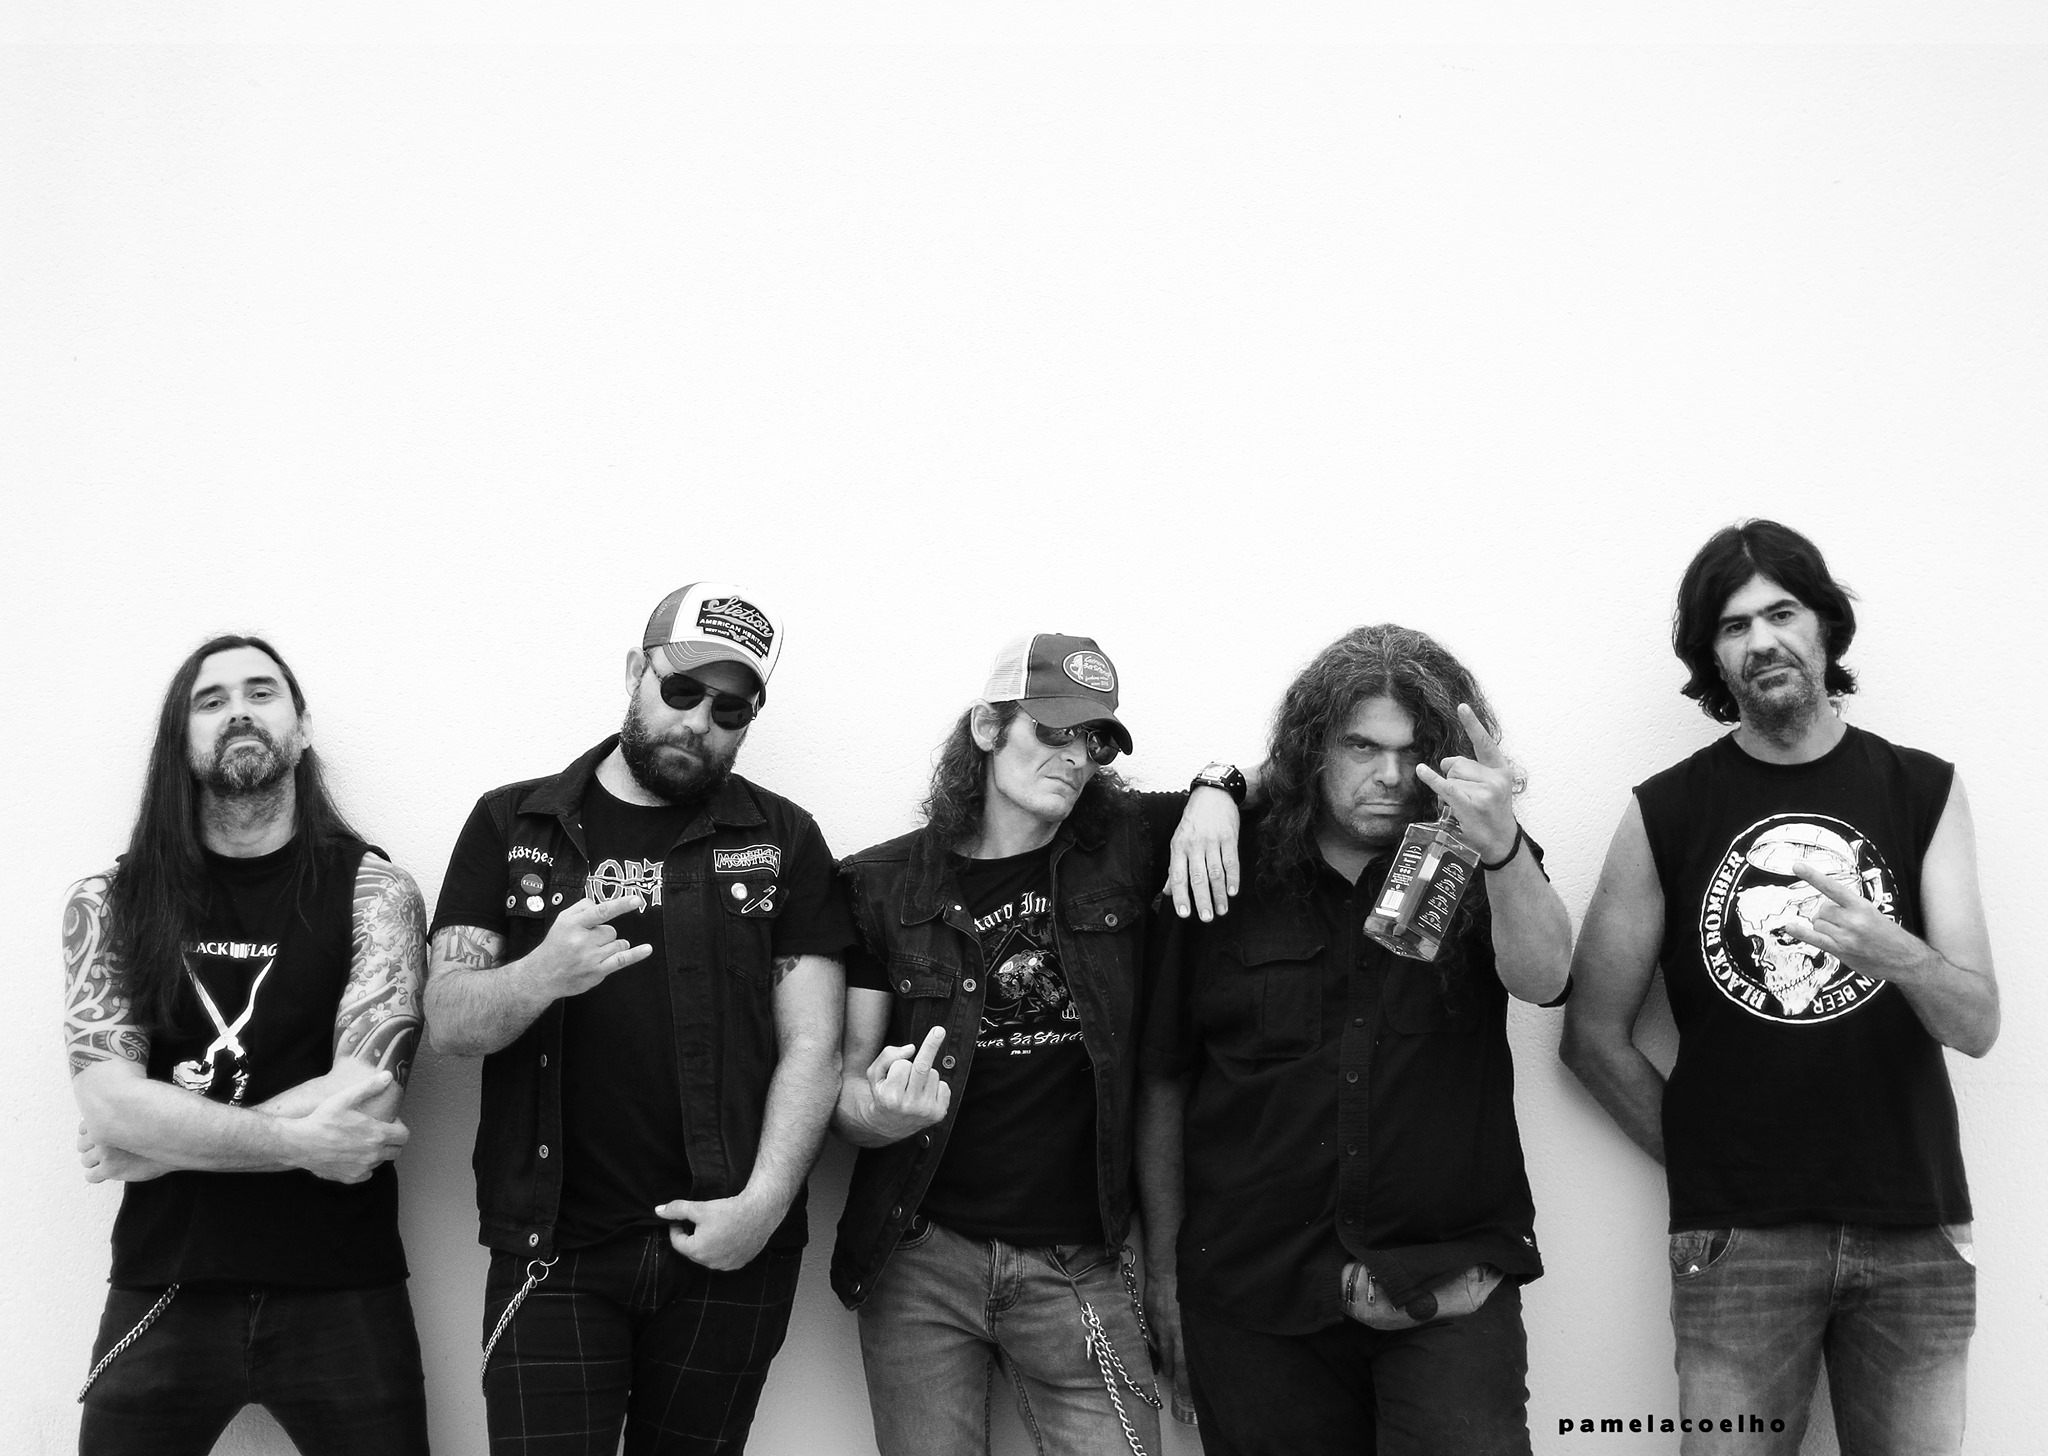 Black Bomber: Motherfucking Hard Rock And Roll from Hell Bierzo en el Cocodrilo café 1